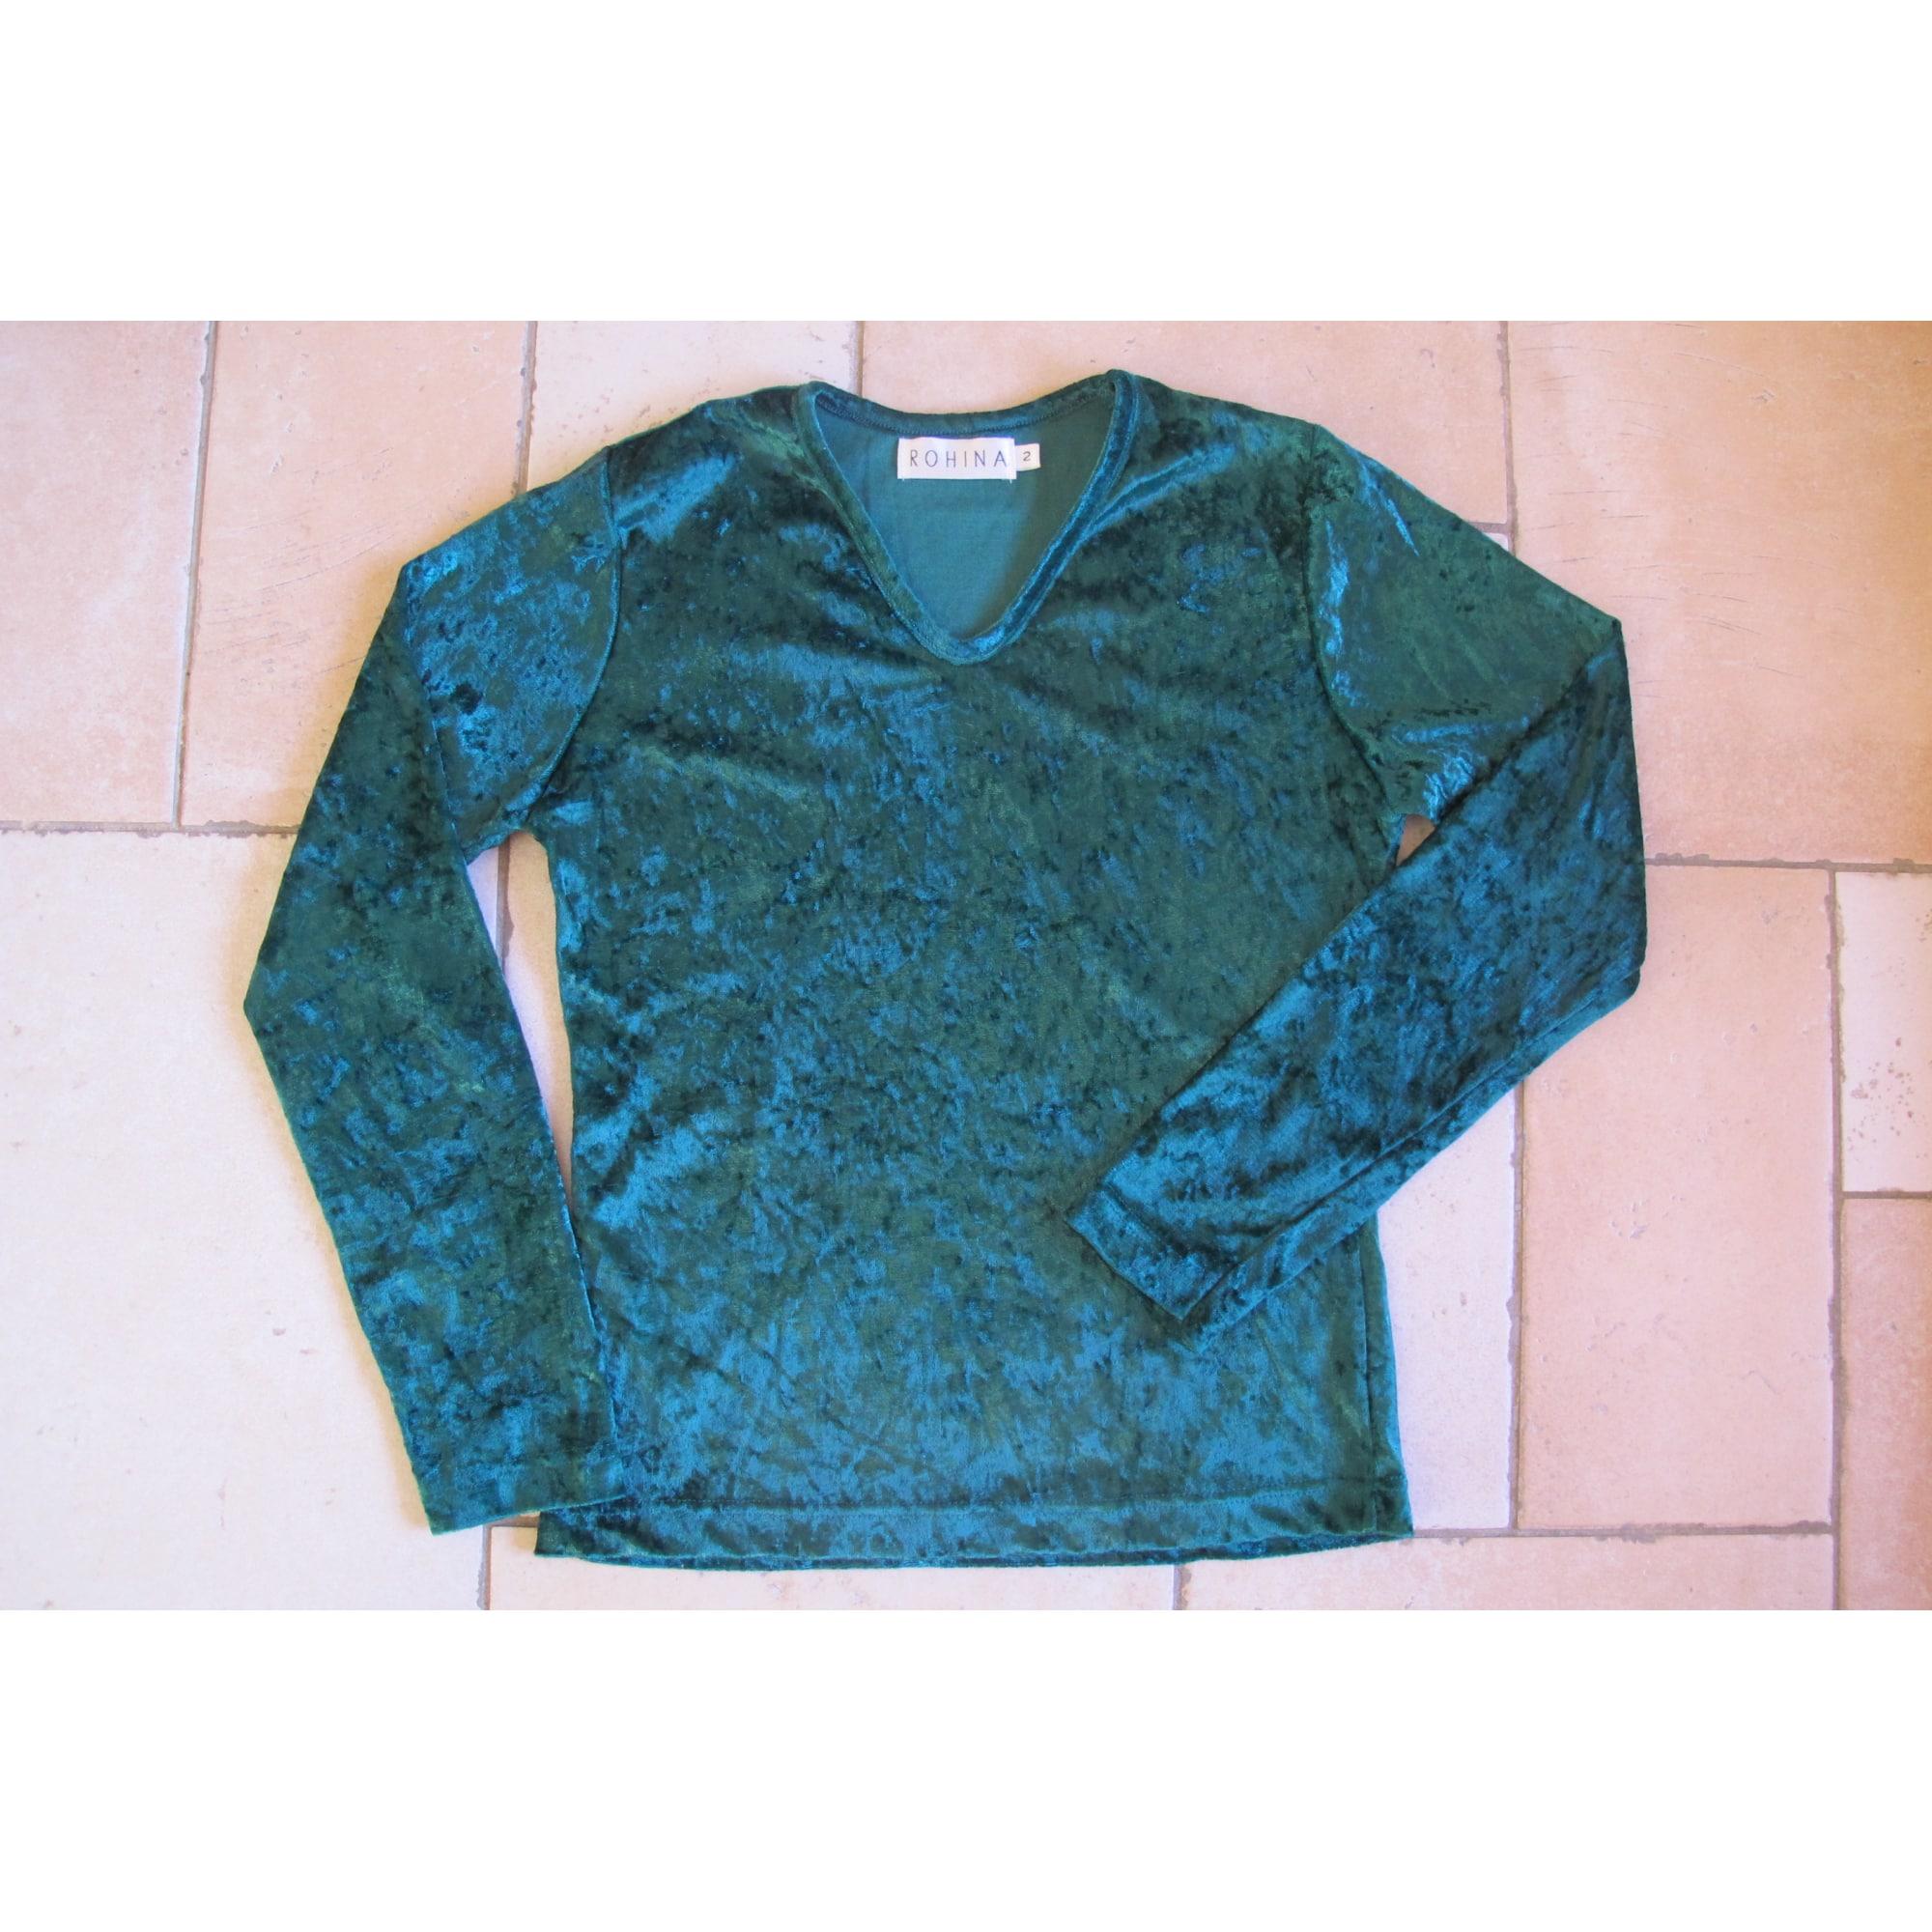 Top, tee-shirt ROHINA Vert